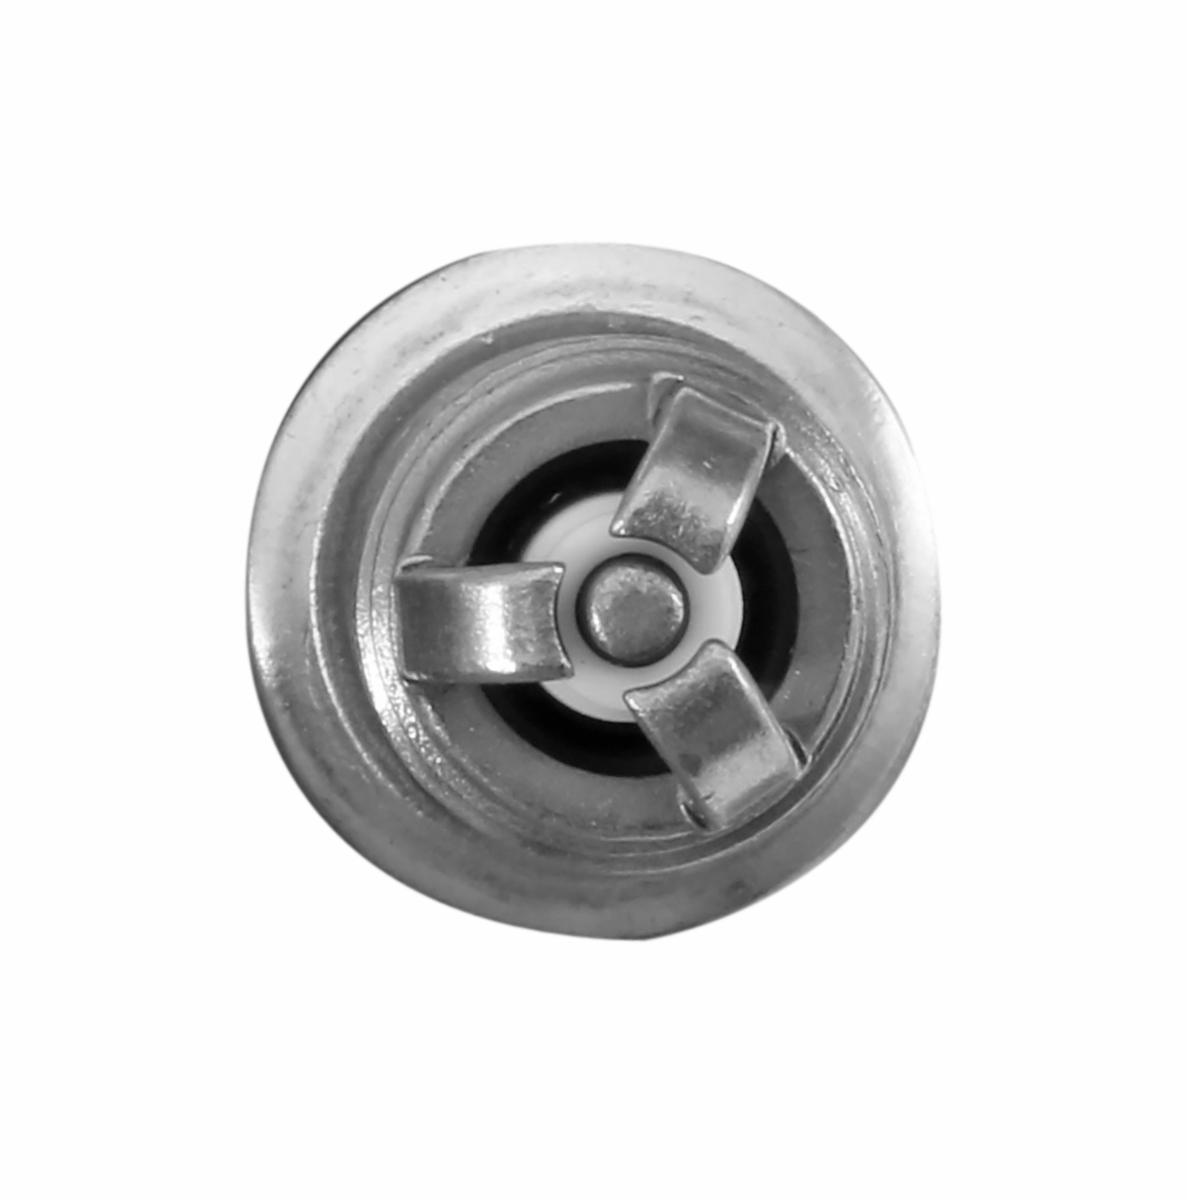 6pcs Spark Plug Pour For BMW E60 E90 E92 E93 135i 335i 535i 12120037244 ZGR-6-STE-2